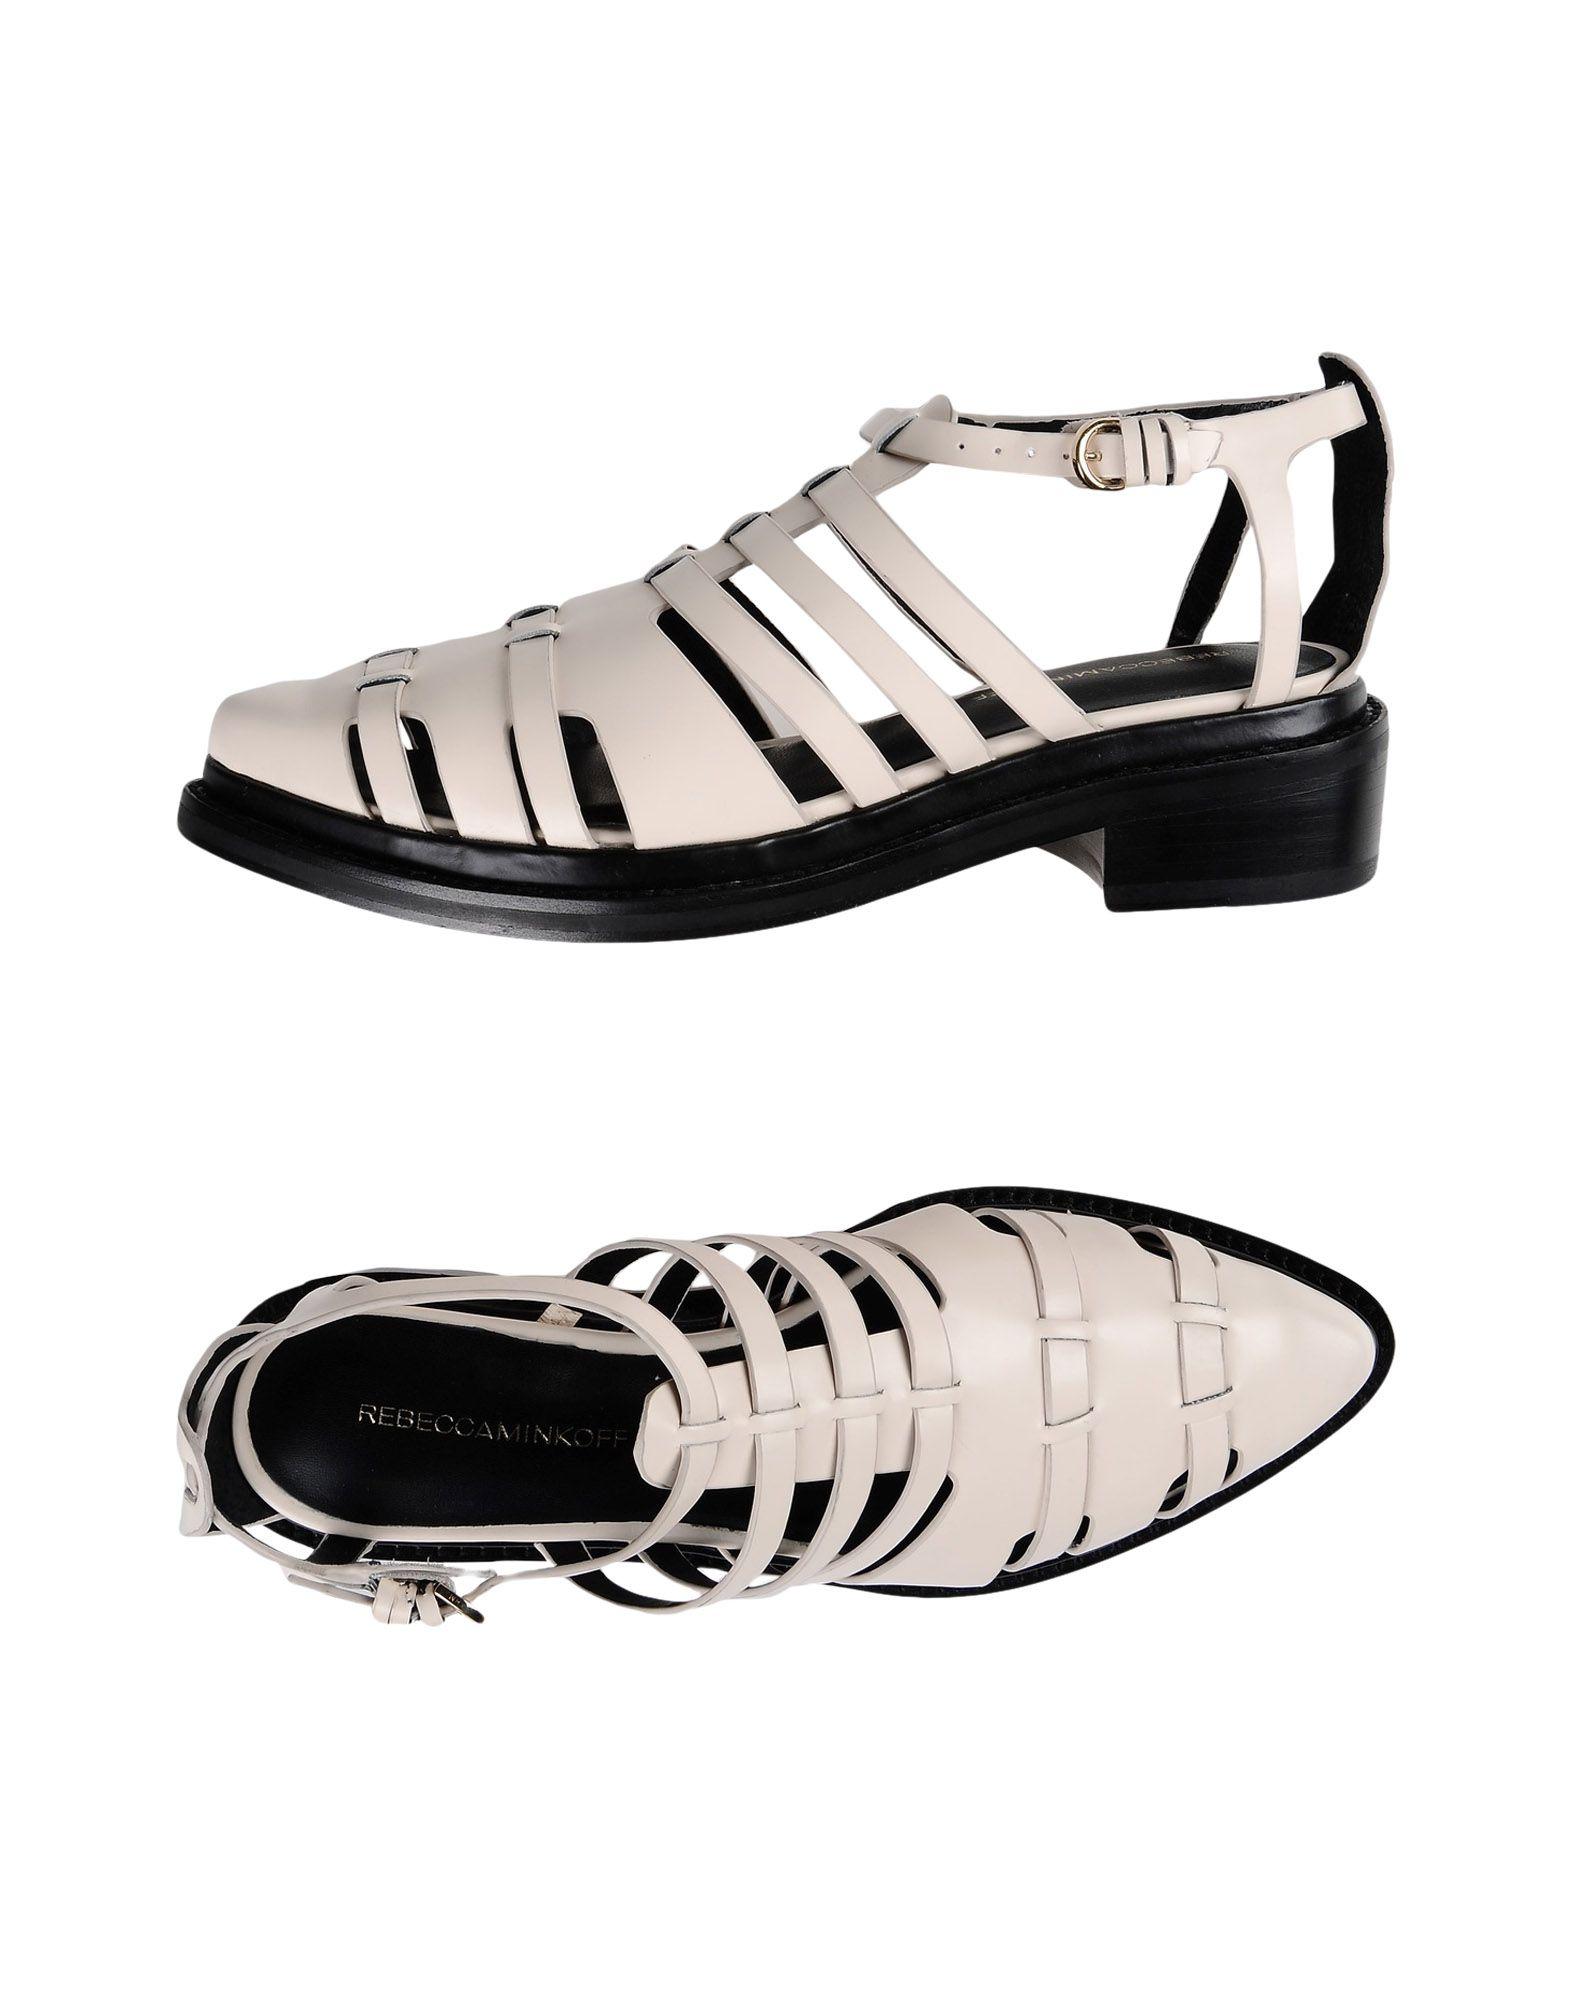 Gut Gut Gut um billige Schuhe zu tragenRebecca Minkoff Sandalen Damen  11430242BT 827f76